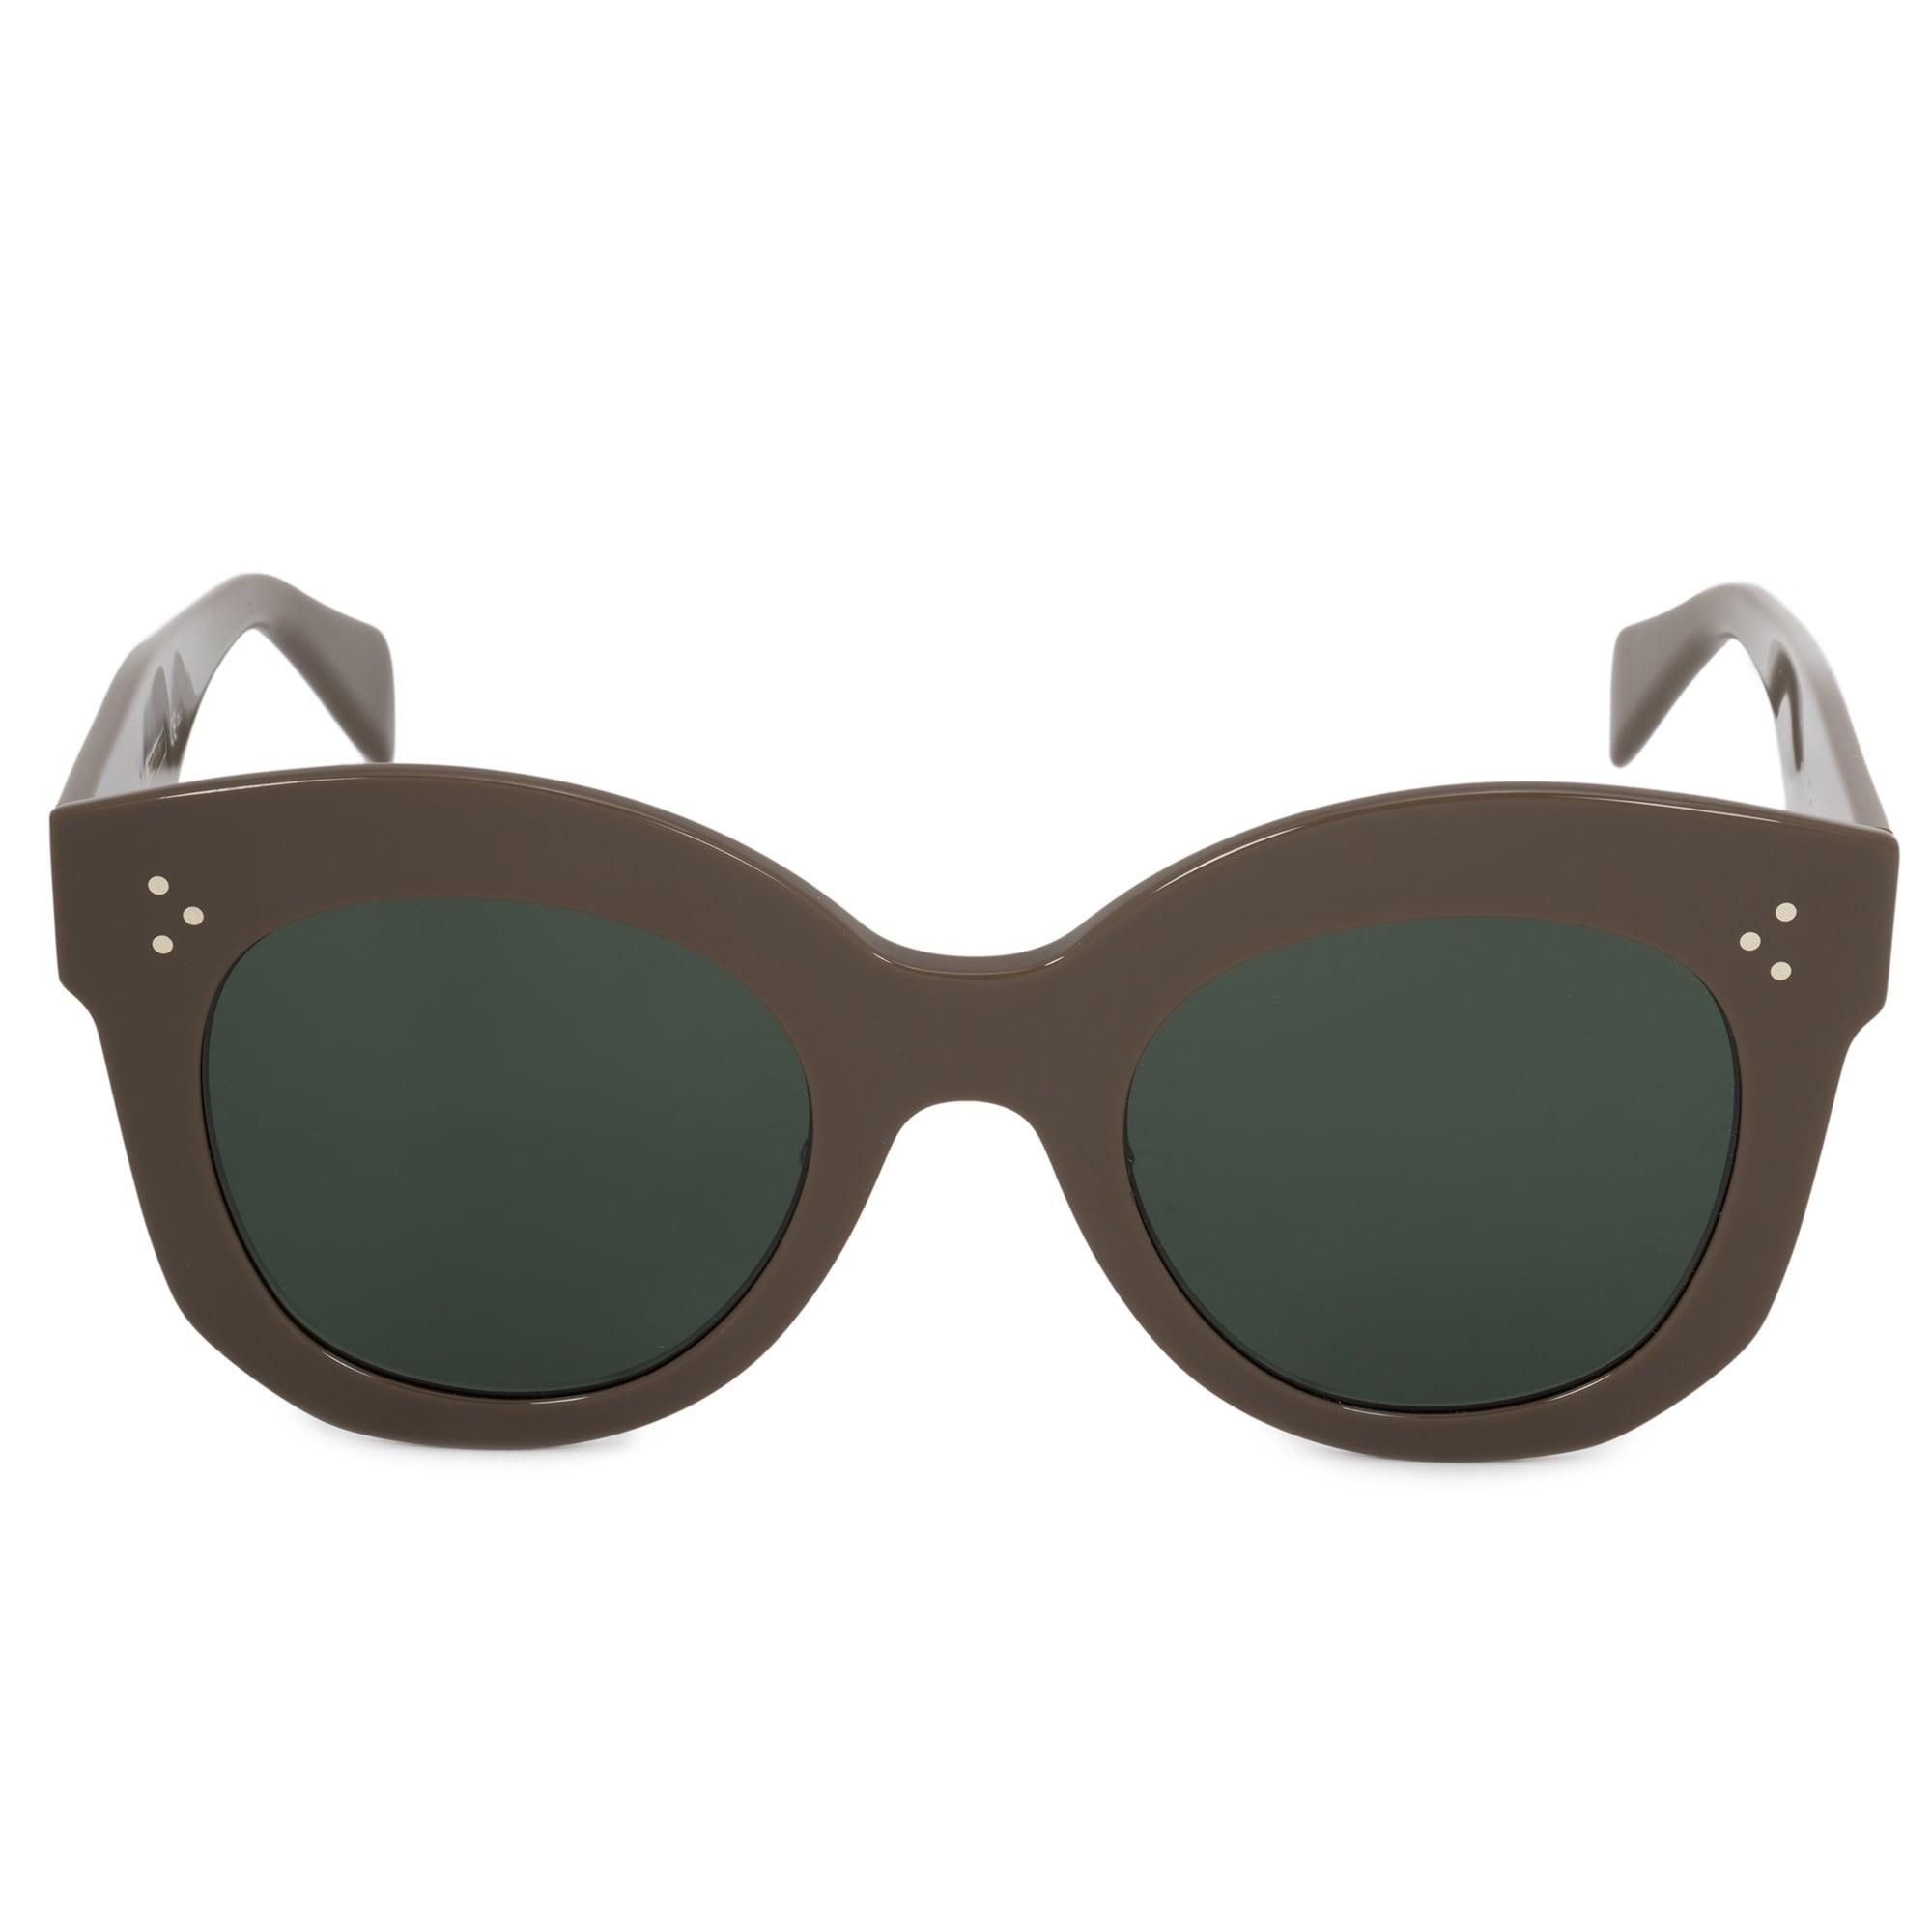 8522dd8935d Celine Sunglasses